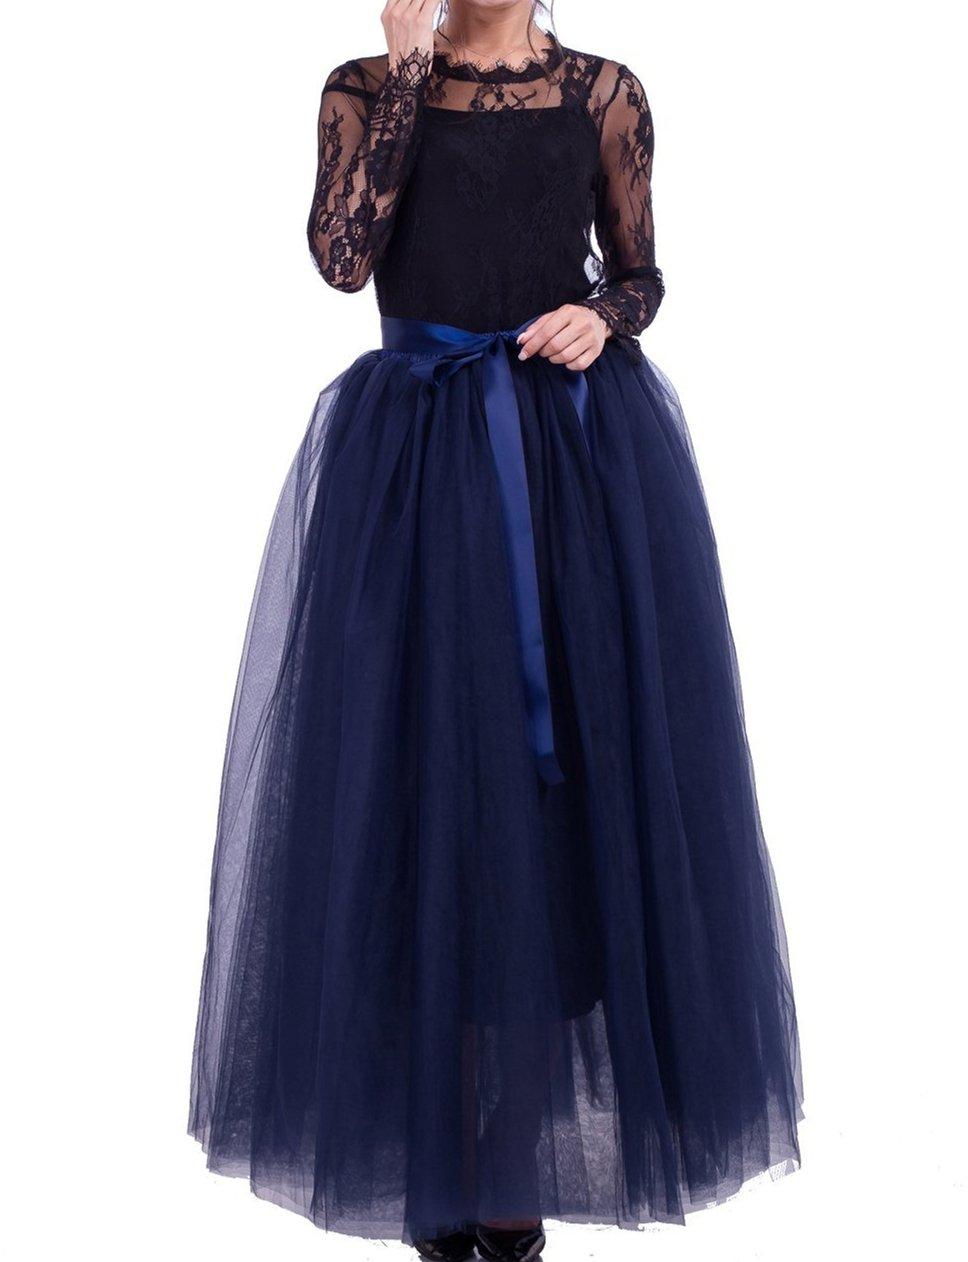 Macola Long Tulle Skirt, Women Floor Length Long Pleated Tutu Skirt for Ball Gown Wedding Party Prom Dress (Navy)